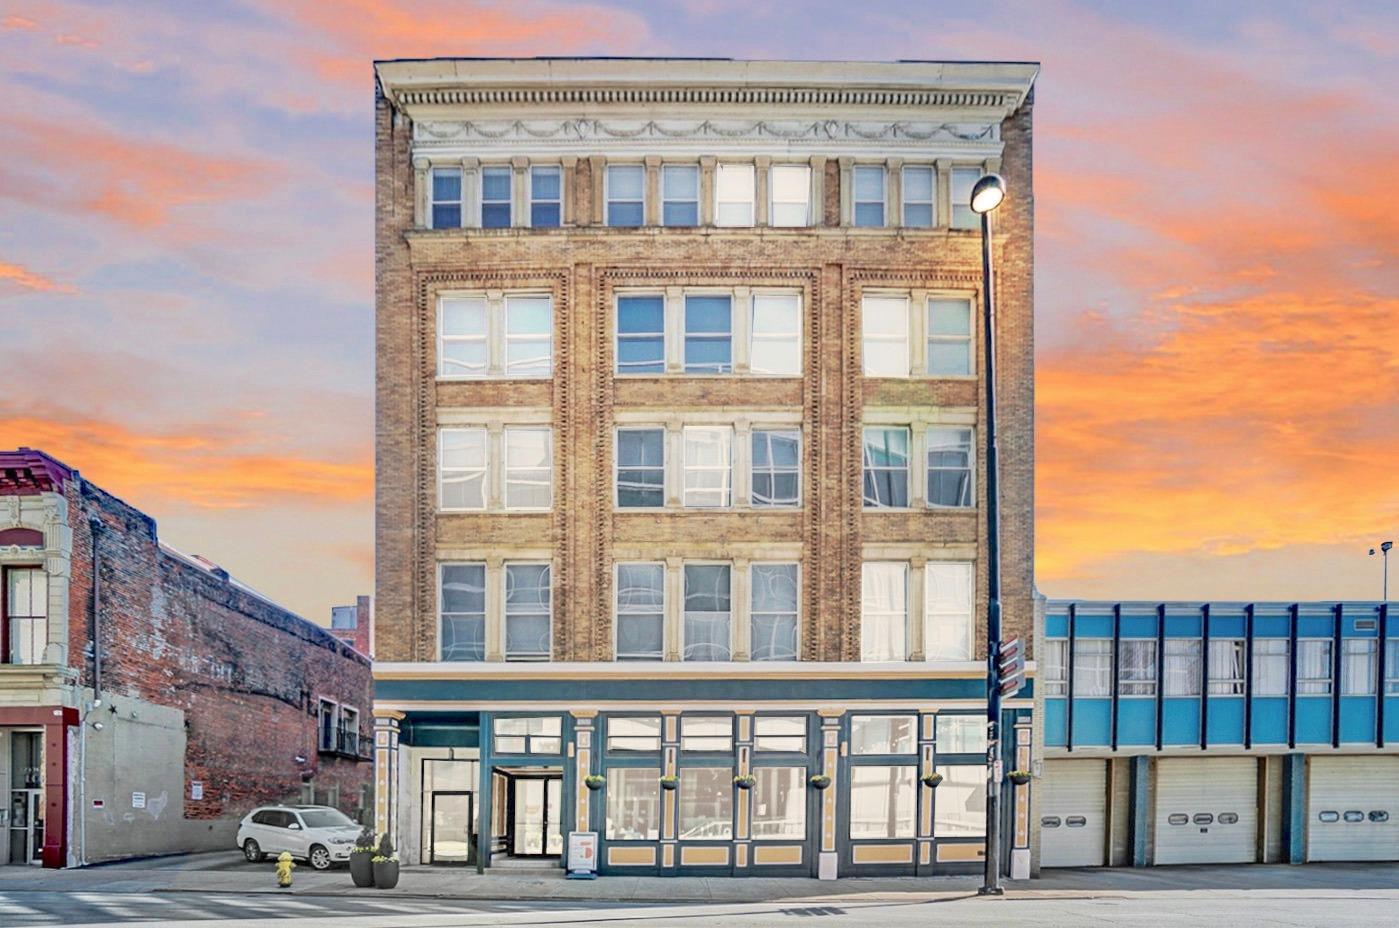 335 Fifth Street, Cincinnati, Ohio 45202, 2 Bedrooms Bedrooms, 6 Rooms Rooms,2 BathroomsBathrooms,Condominium,For Sale,Fifth,1708237